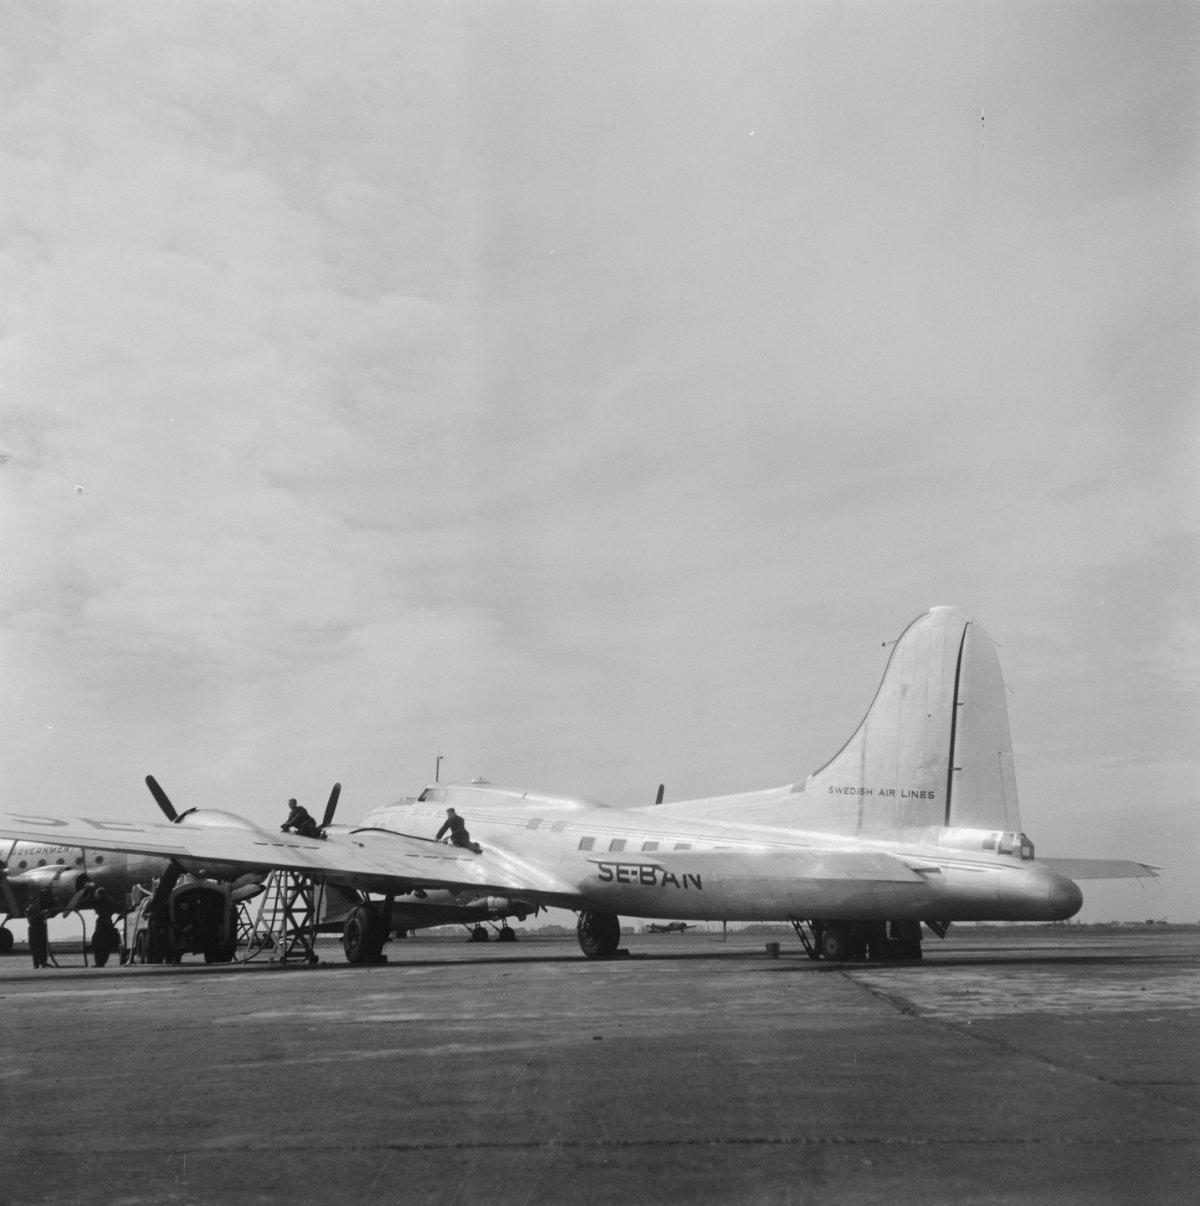 B-17 #42-3490